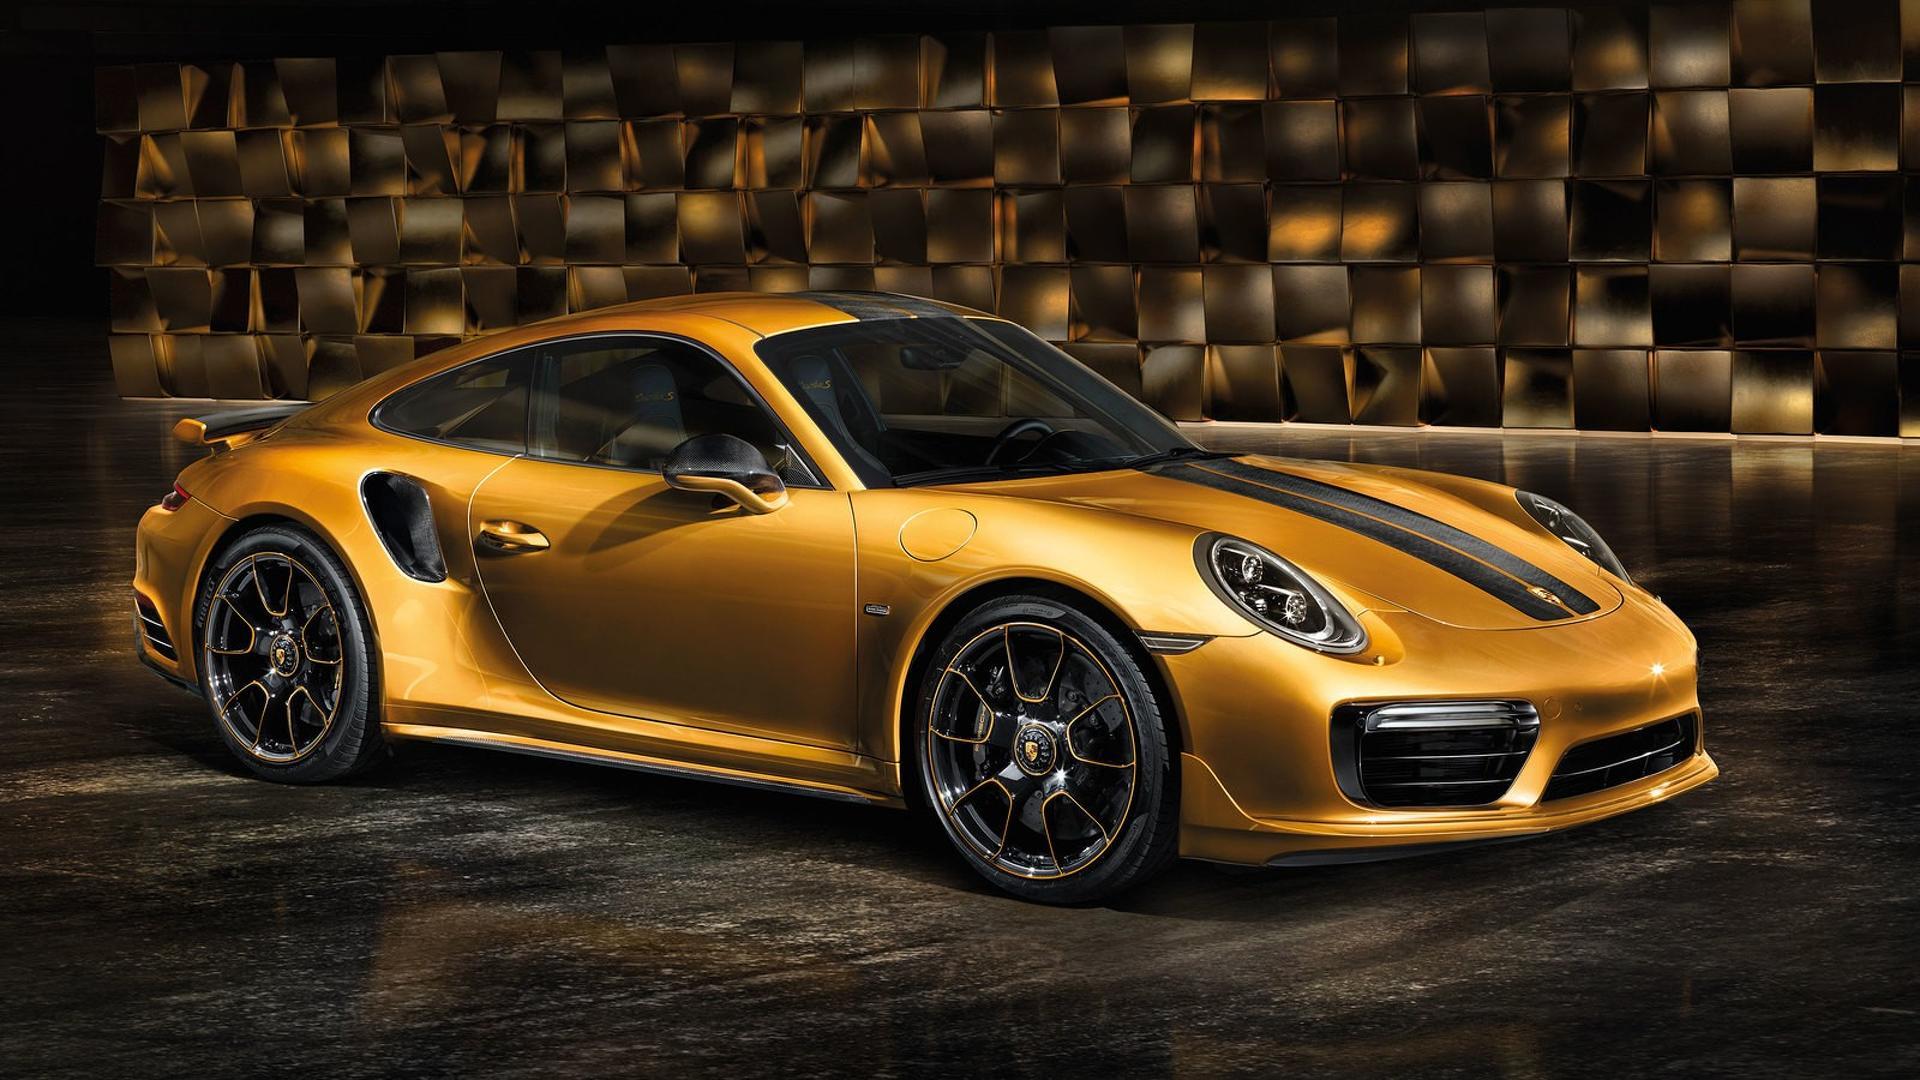 Porsche_911_Turbo_S_Exclusive_Series_02